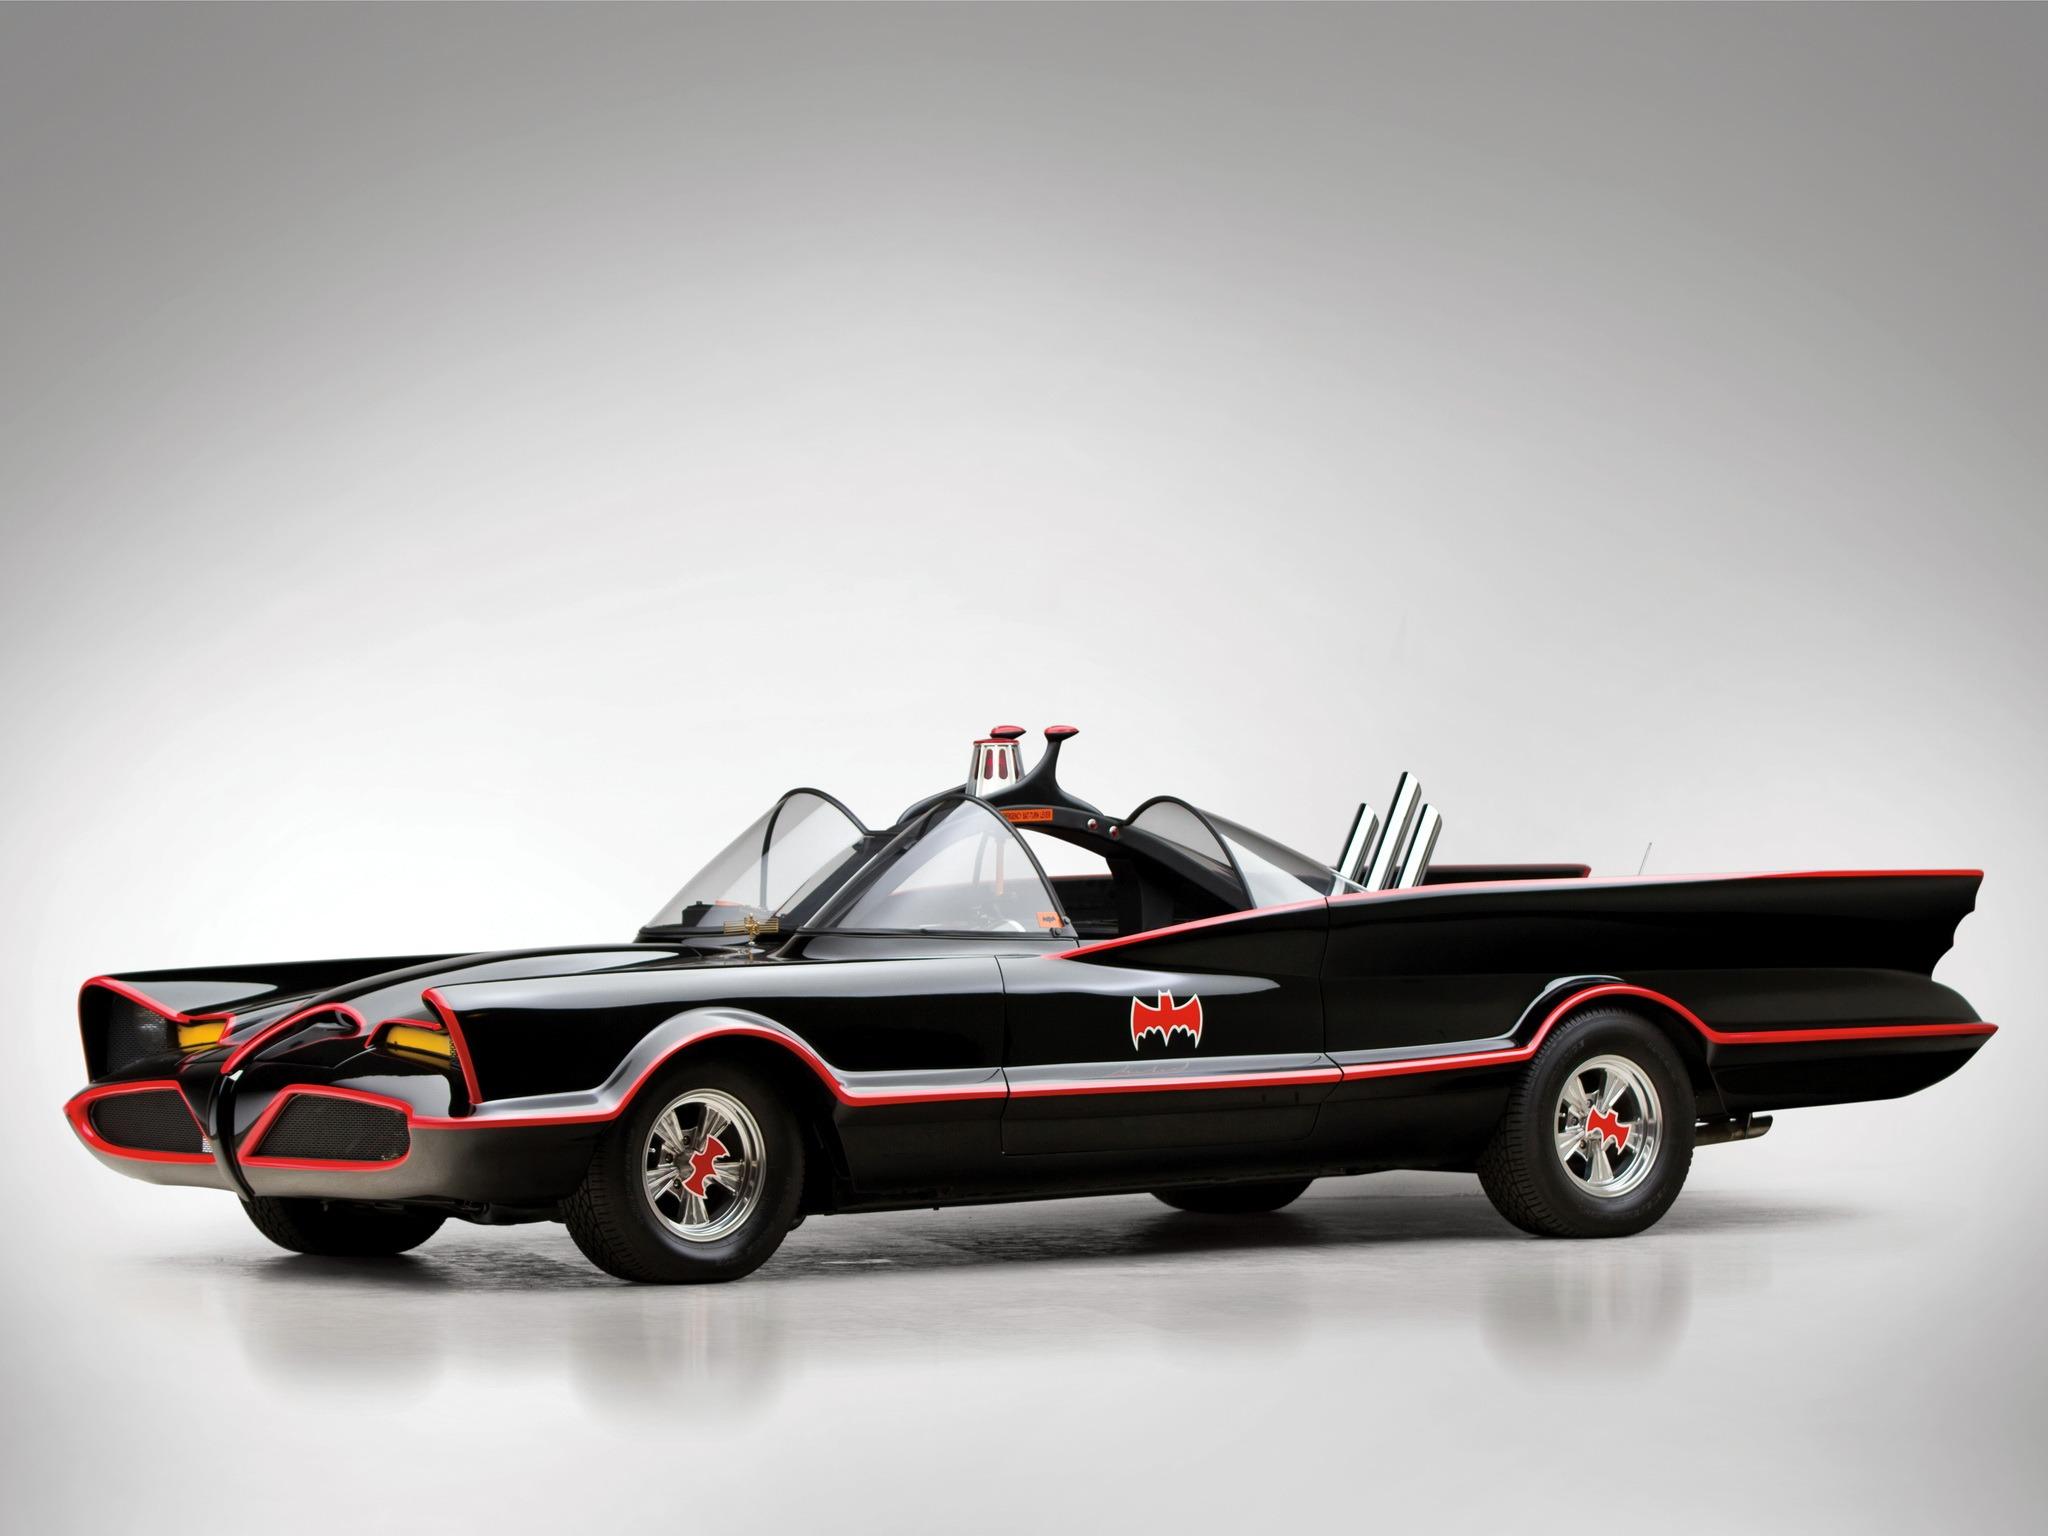 4k Wallpaper Muscle Car Lincoln Futura Batmobile By Barris Kustom 1966 Old